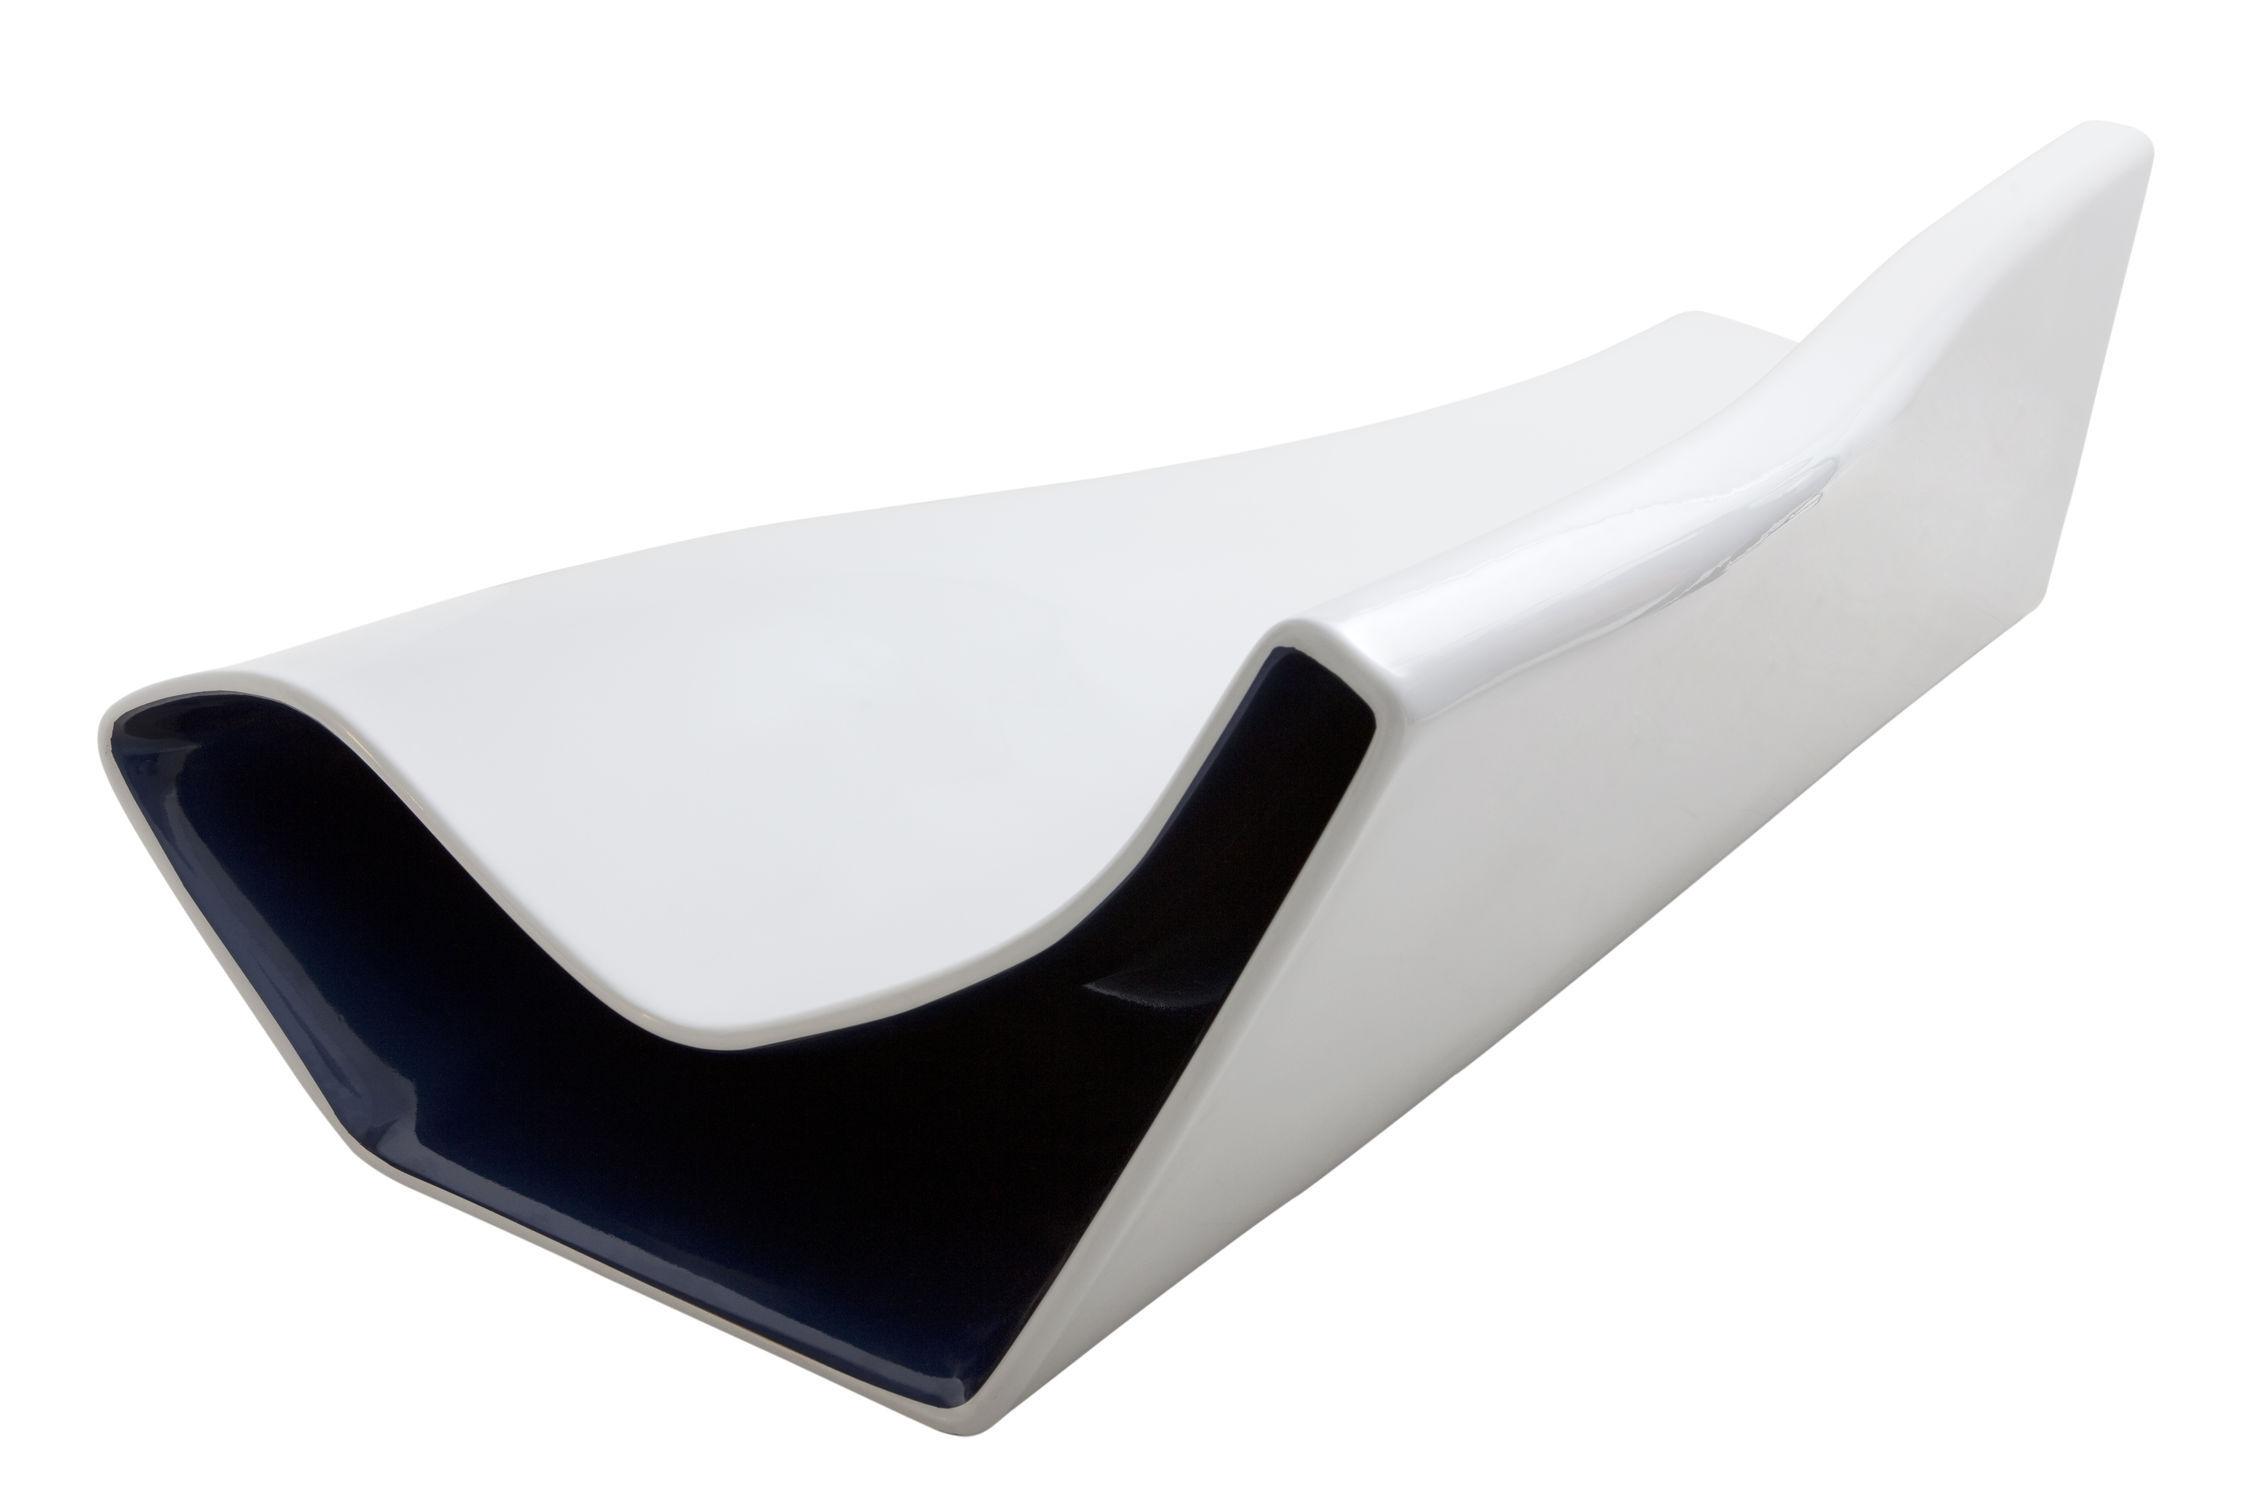 sofa rph muuto outline contemporary outdoor leather by fabio novembre a